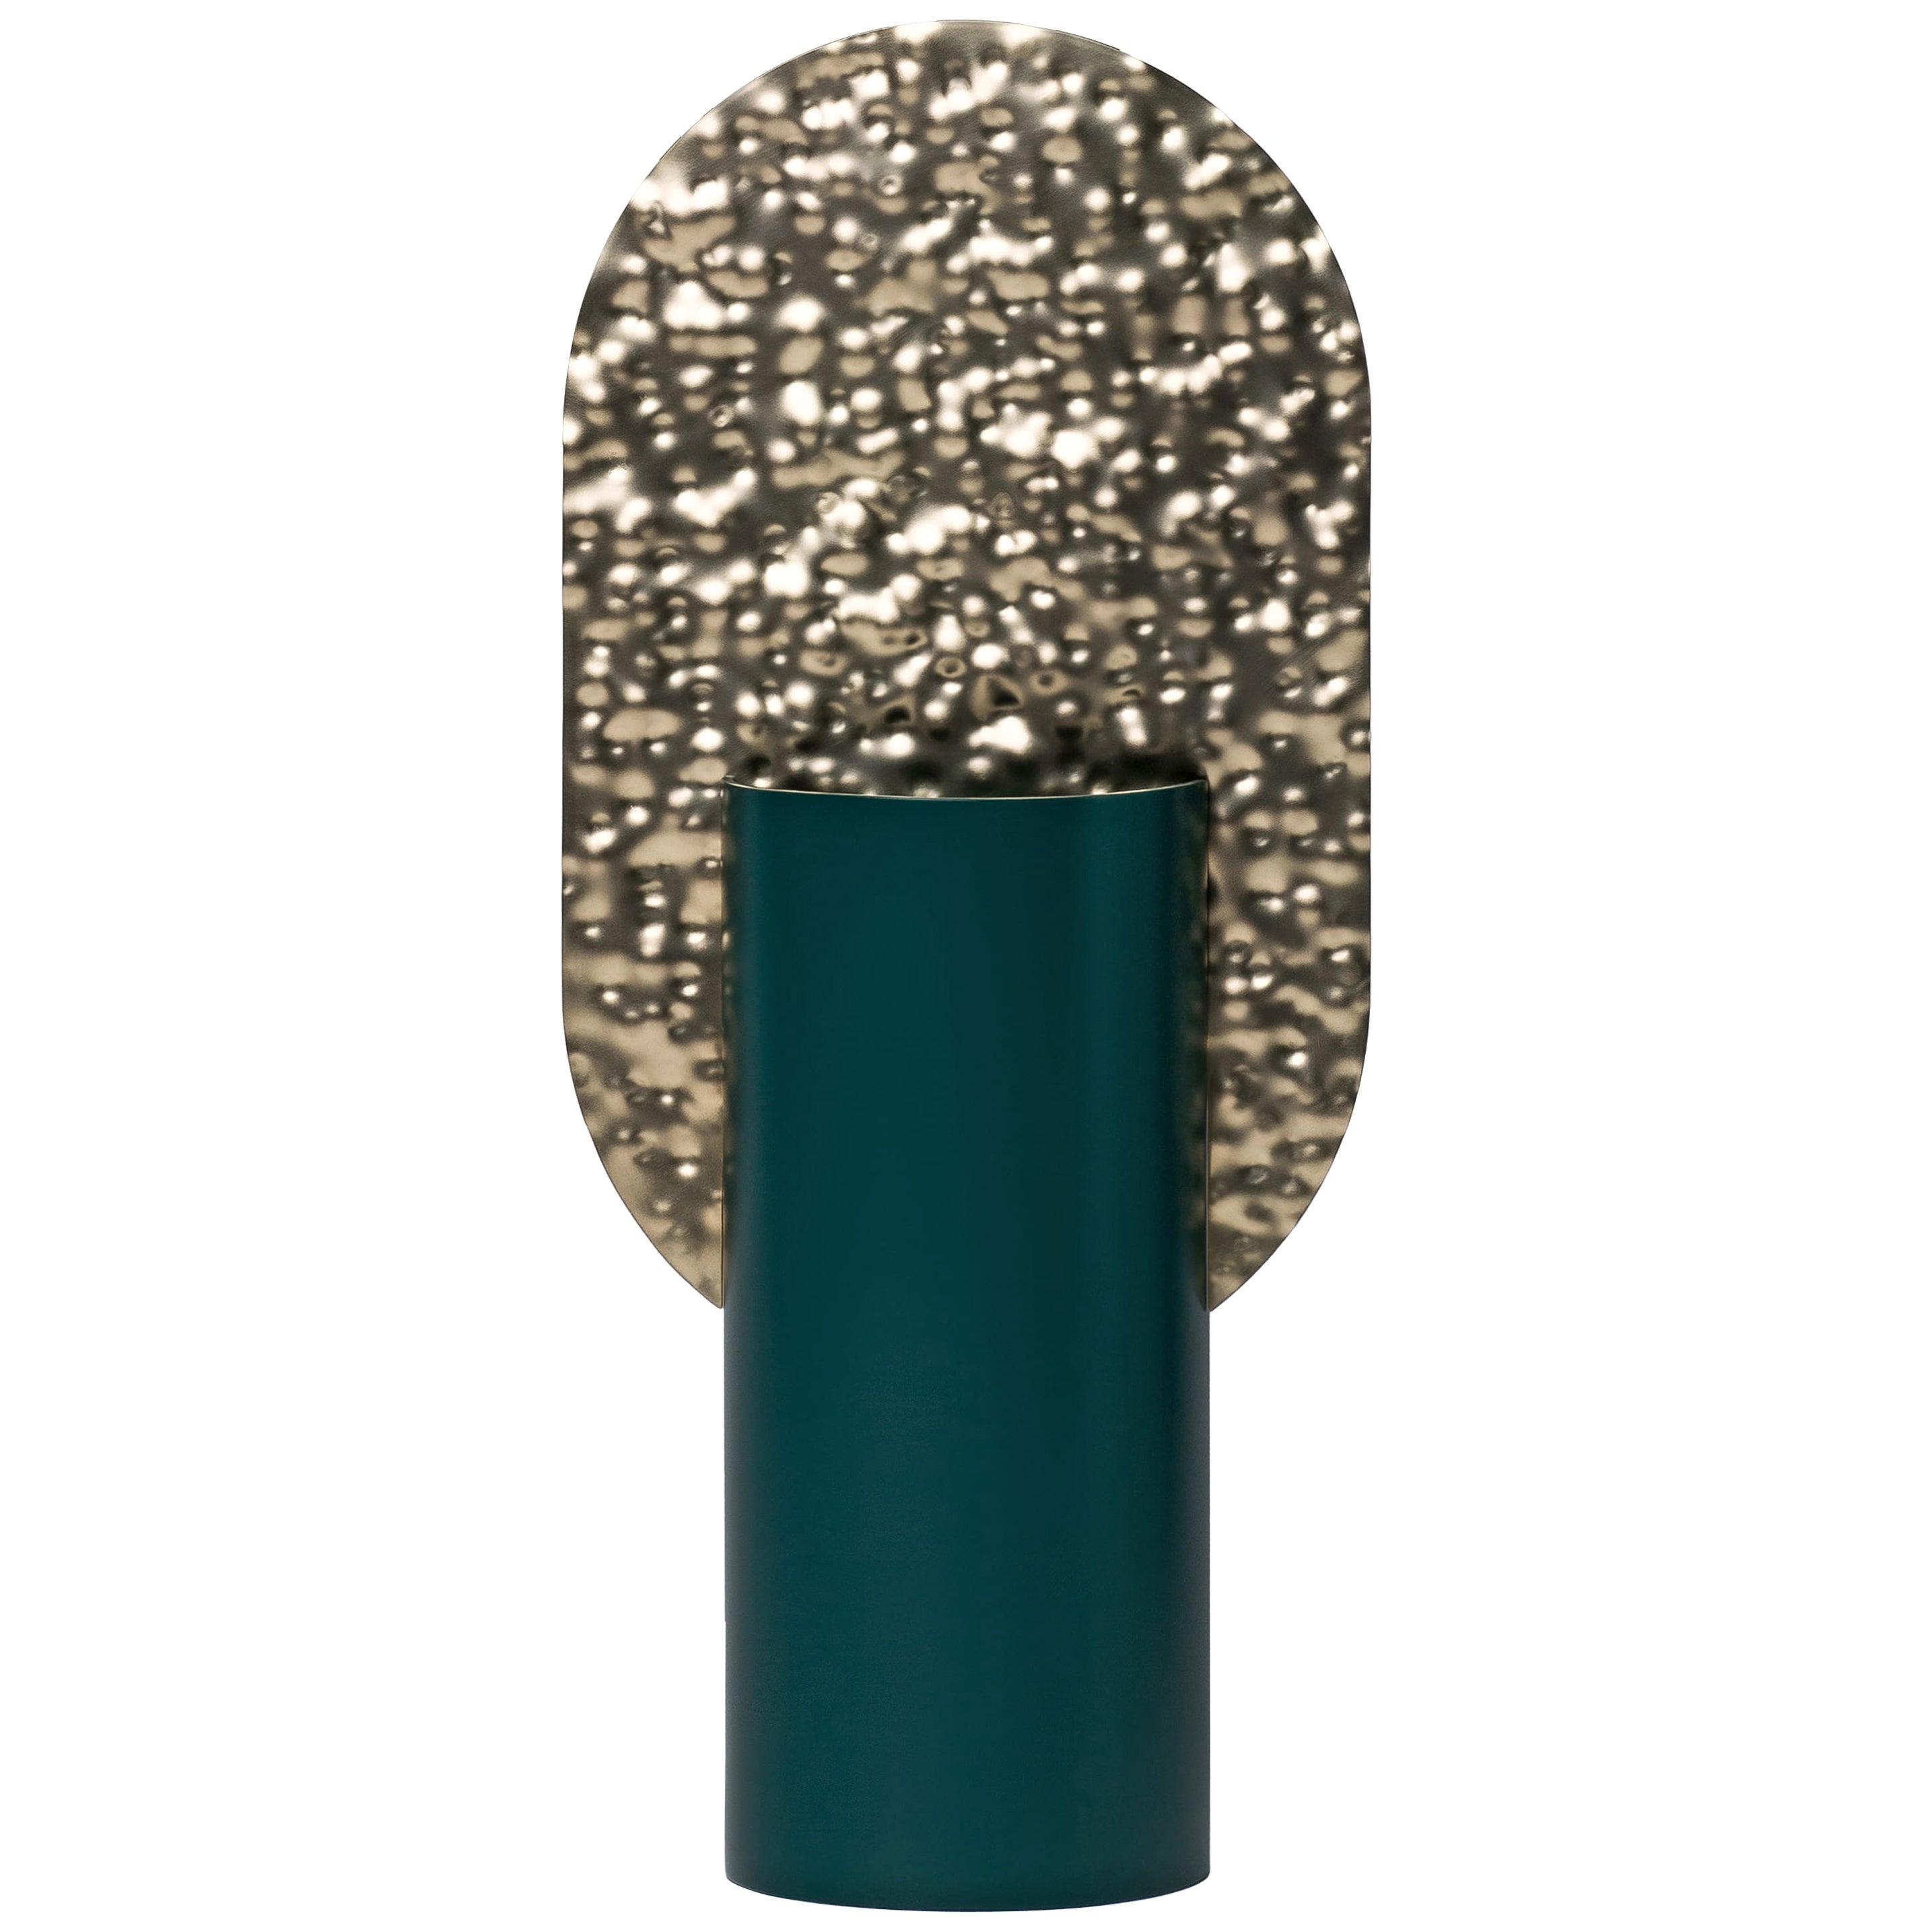 Genke Limited Edition Vase by Noom